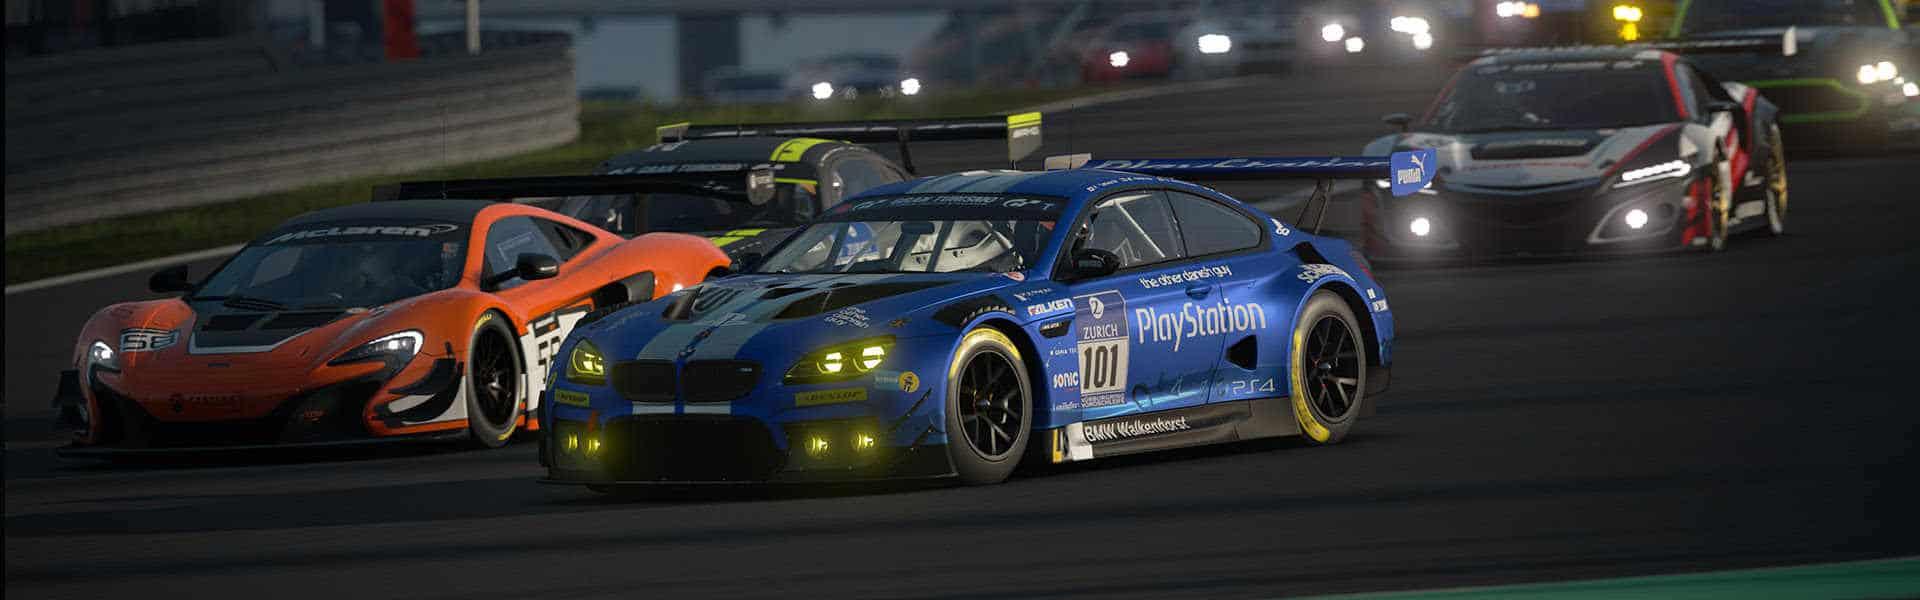 Gran Turismo 7 Release Date, Trailer, News and Rumors